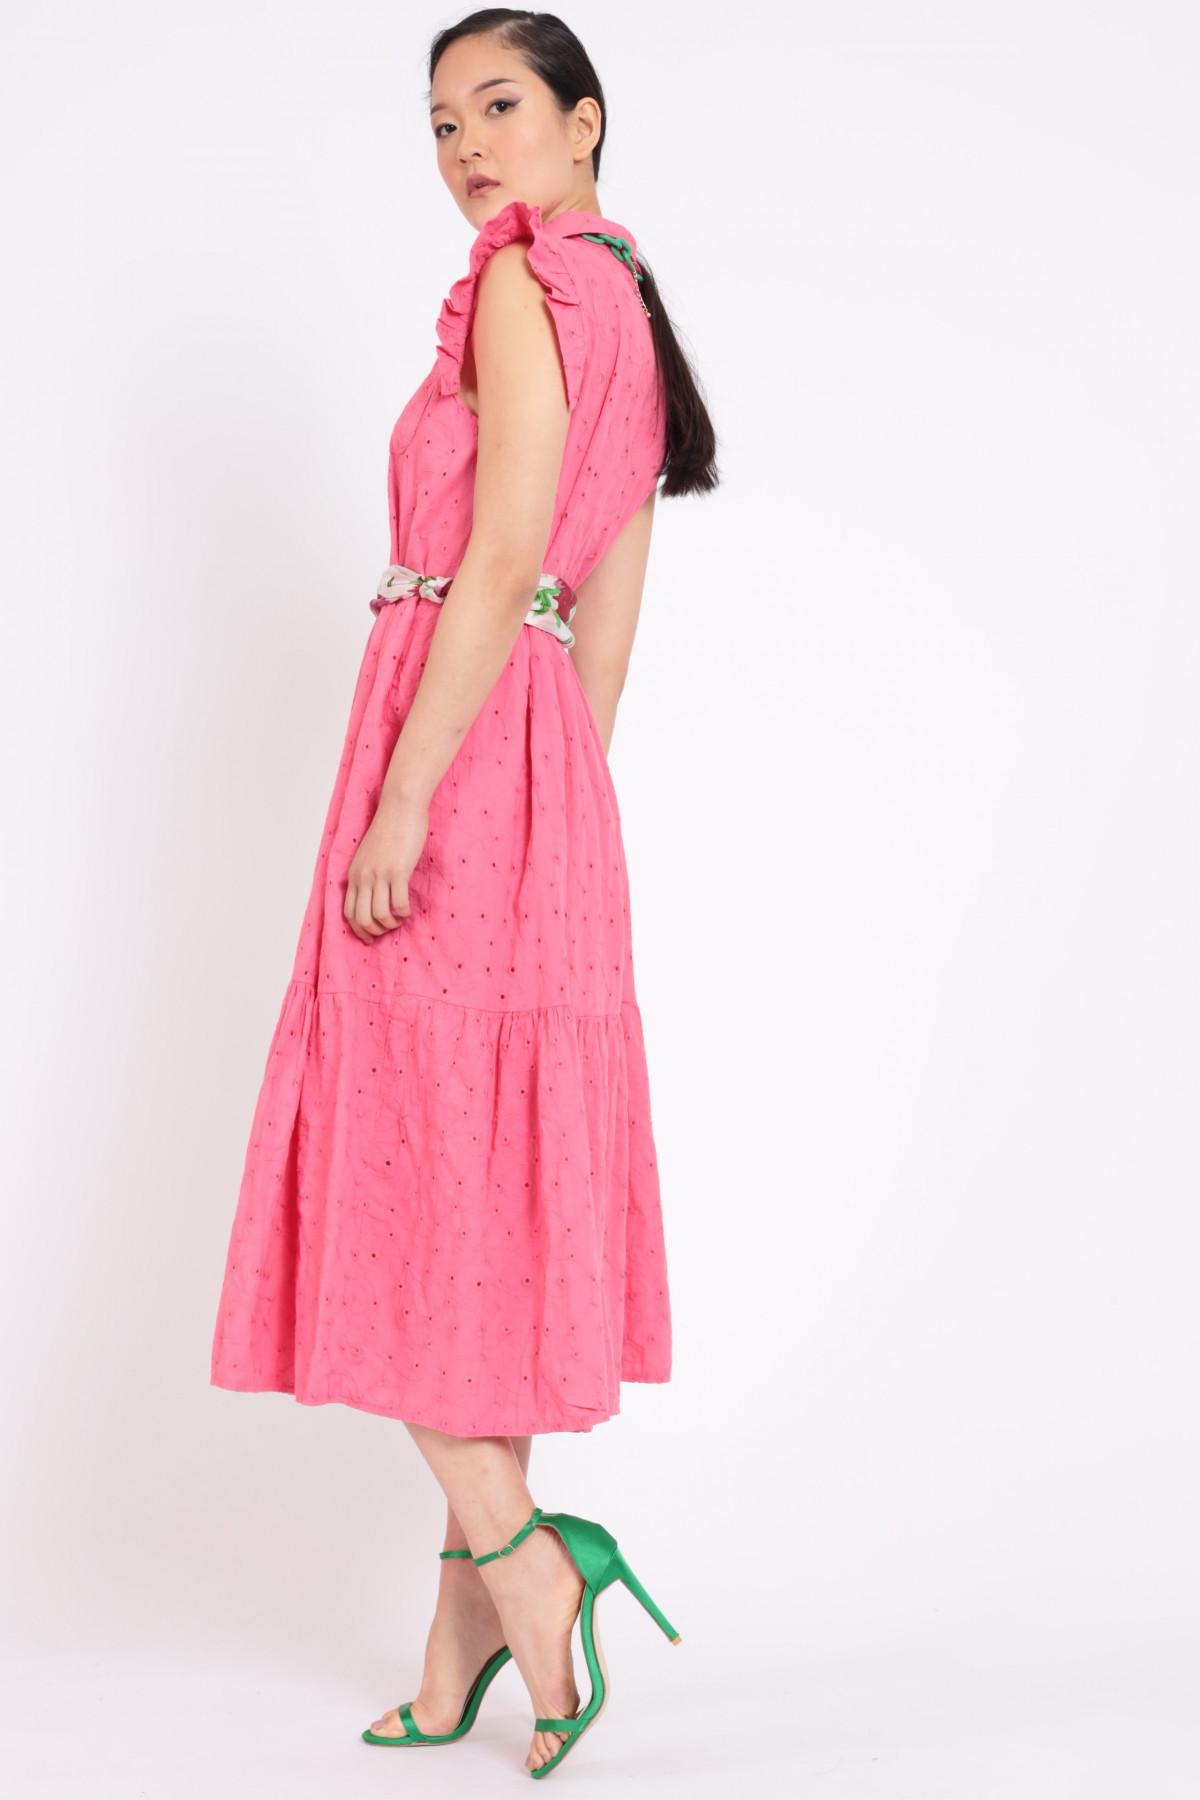 Sangallo Sleeveless Dress with Rouches